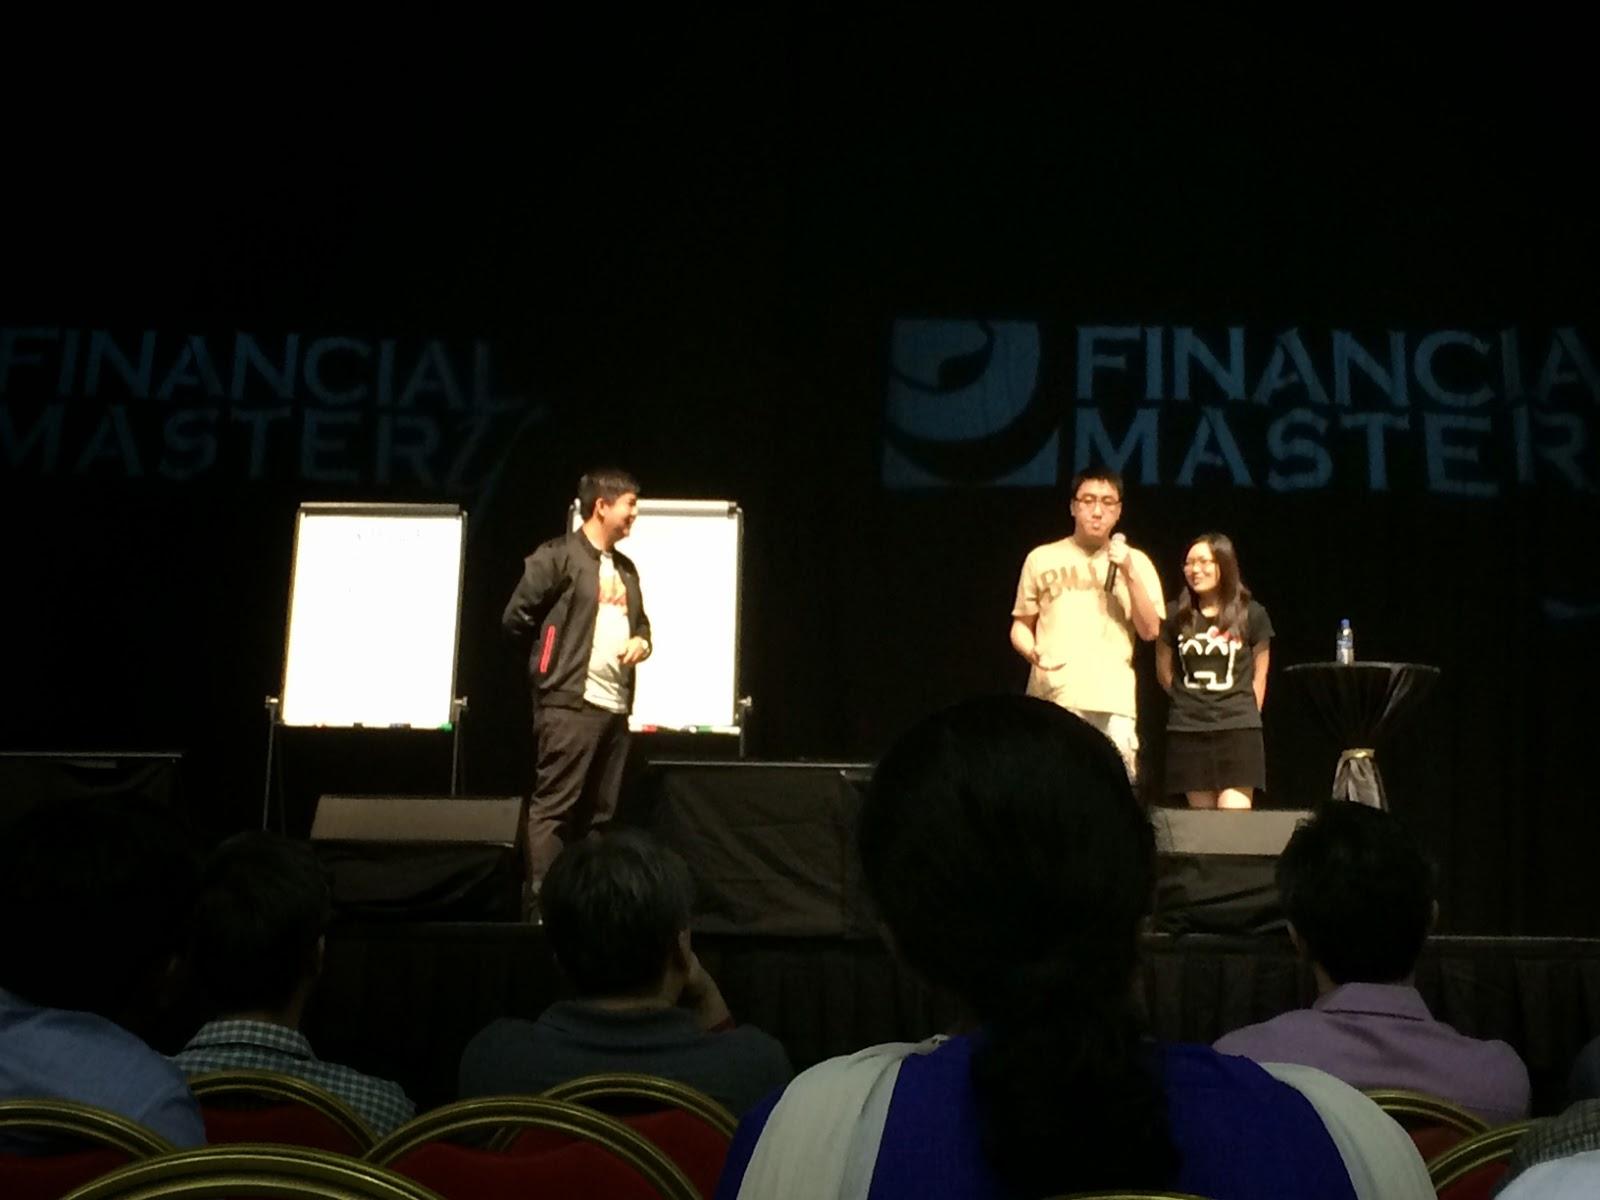 Financial Seminar 2014